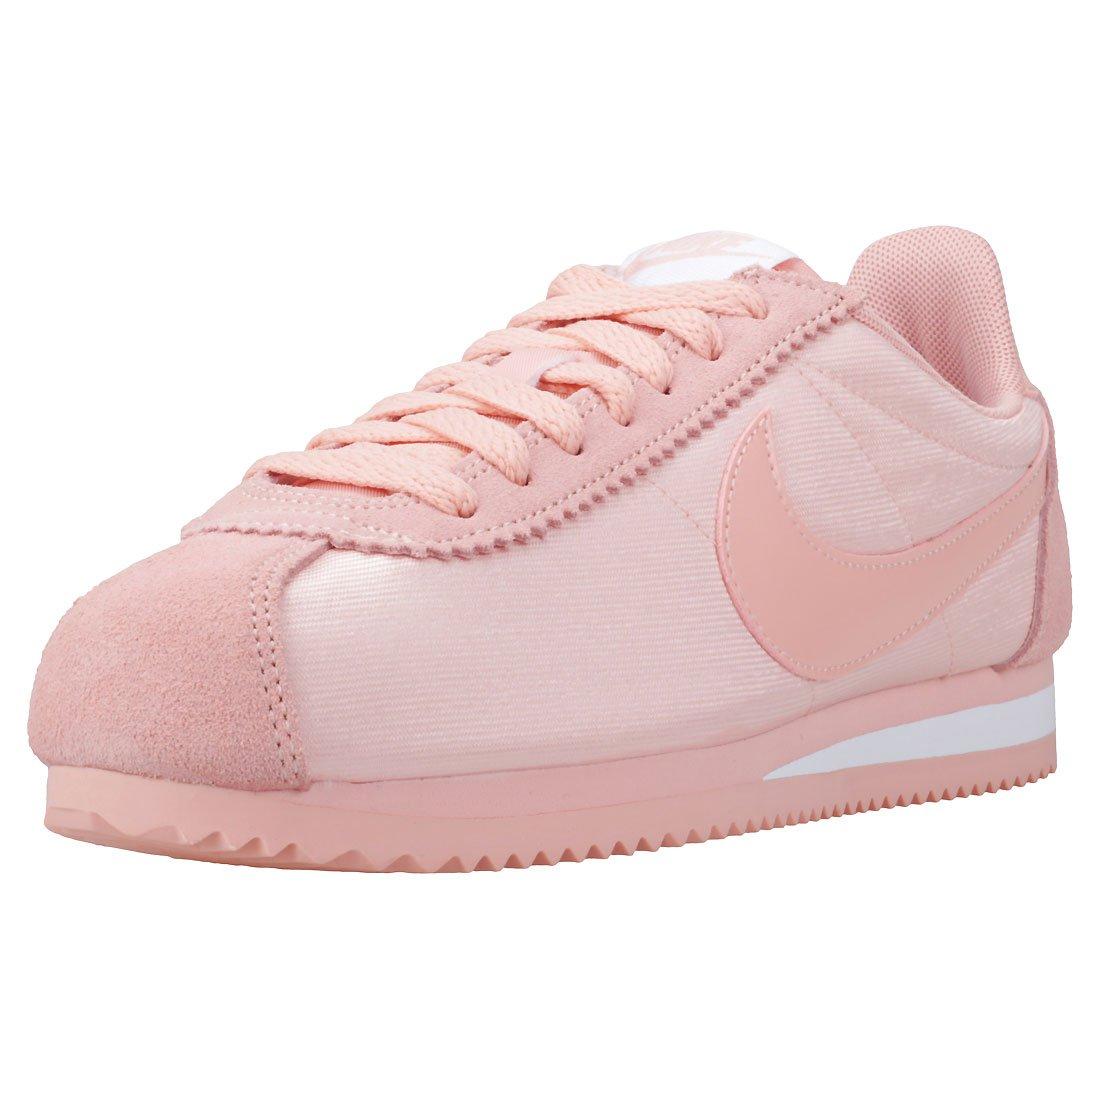 Nike Wmns Classic Cortez Scarpa Donna NY Donna Mod. Mod. Mod. 749864 | Trendy  2e7a6c